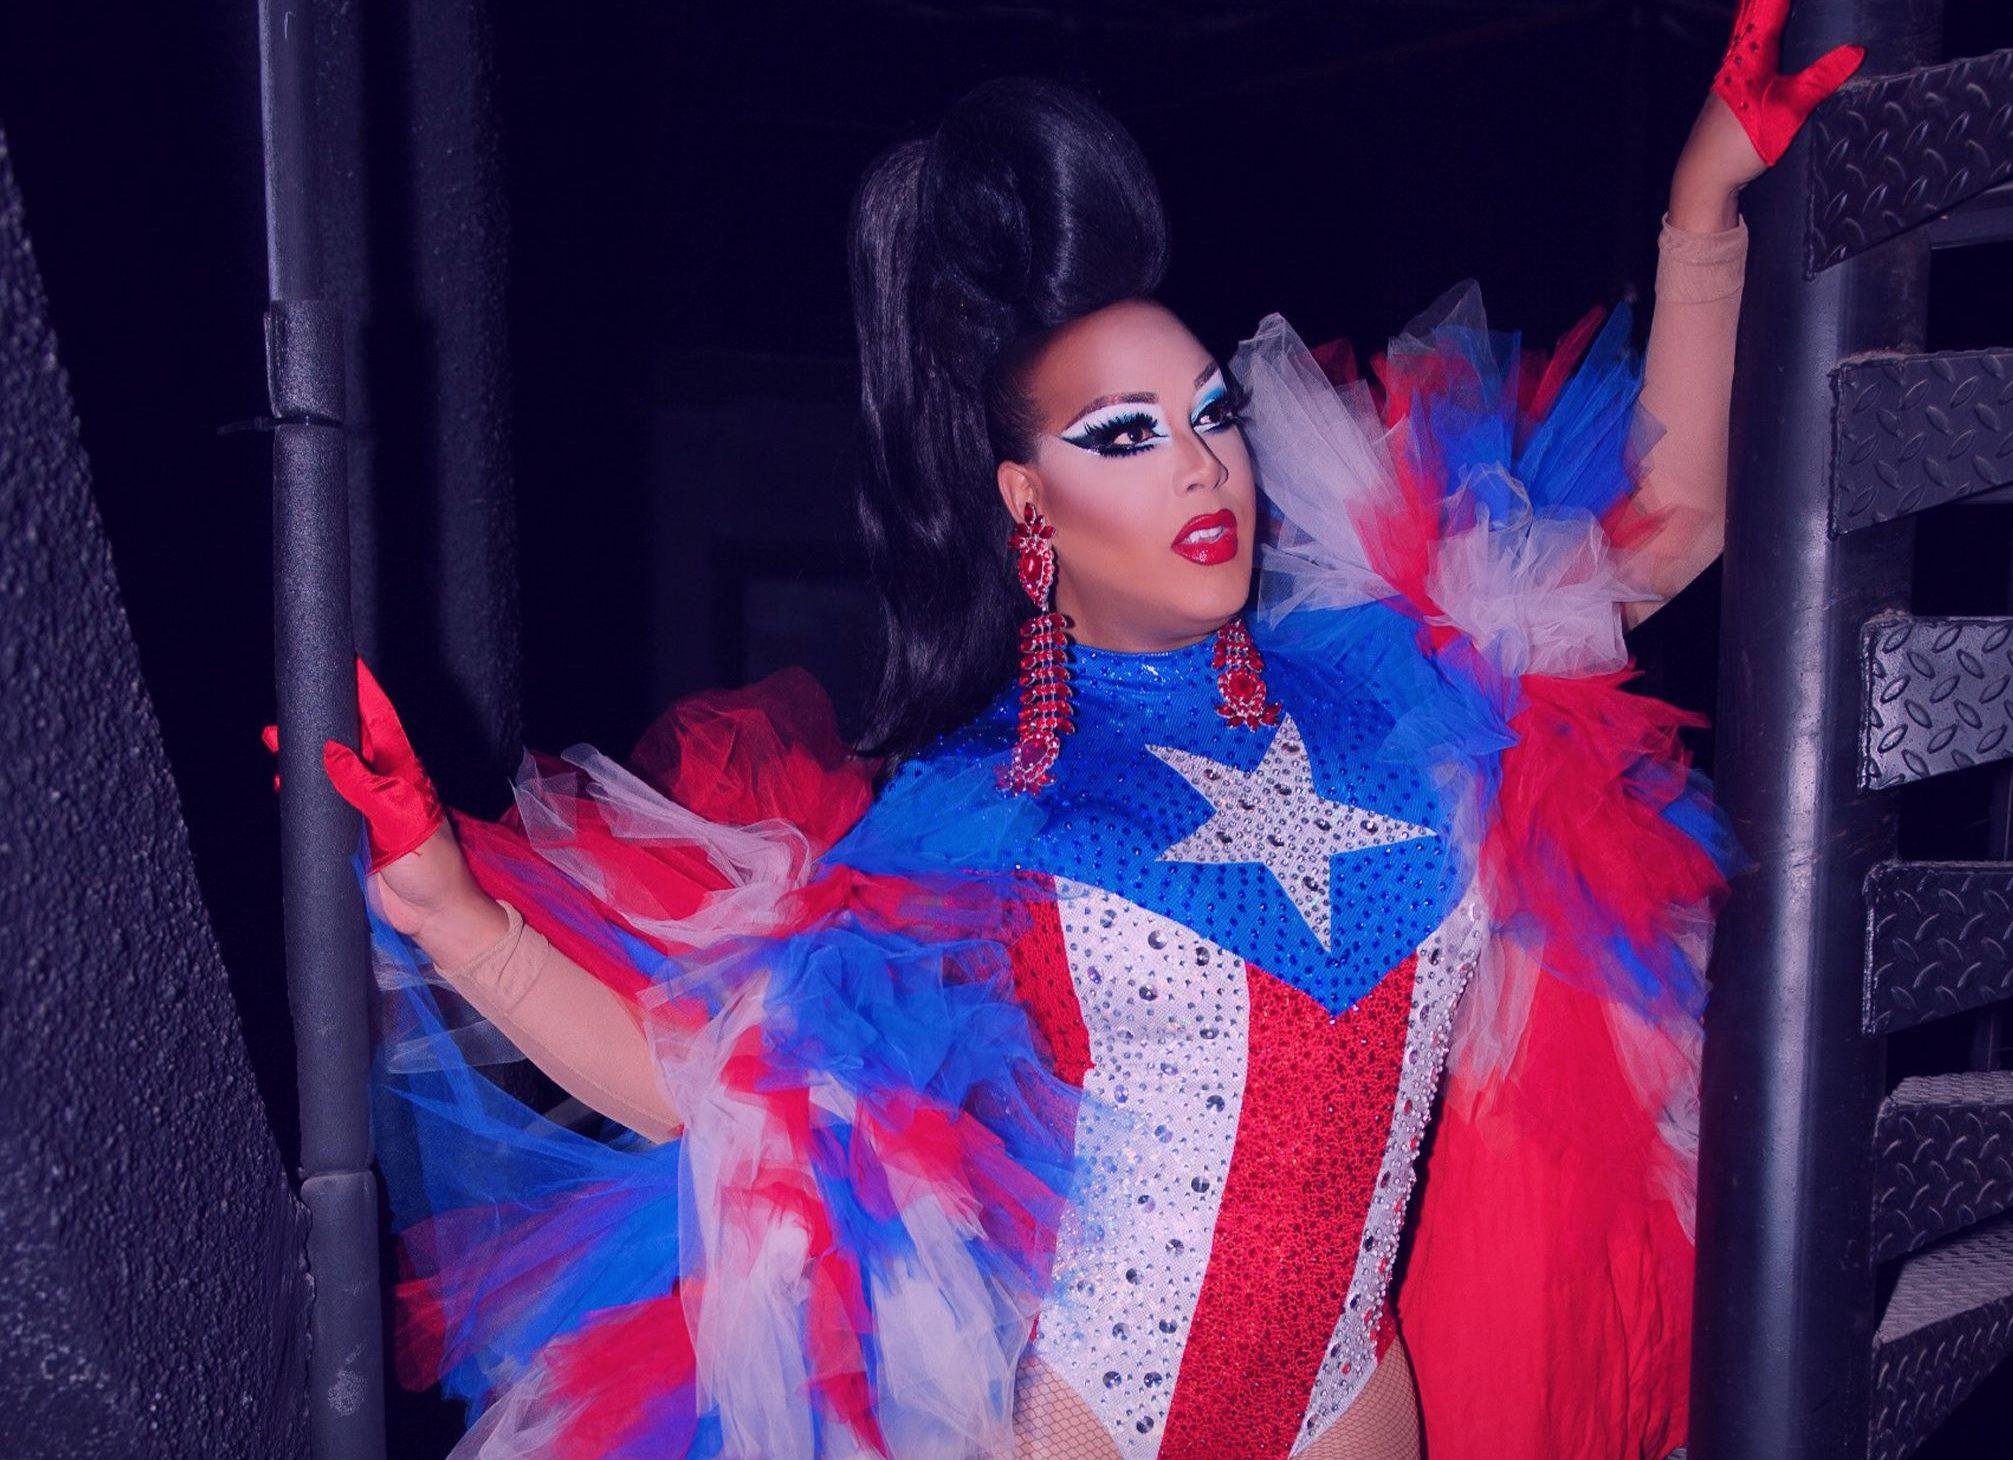 Alexis Mateo on Representing Boricuas on 'Rupaul's Drag Race' & More